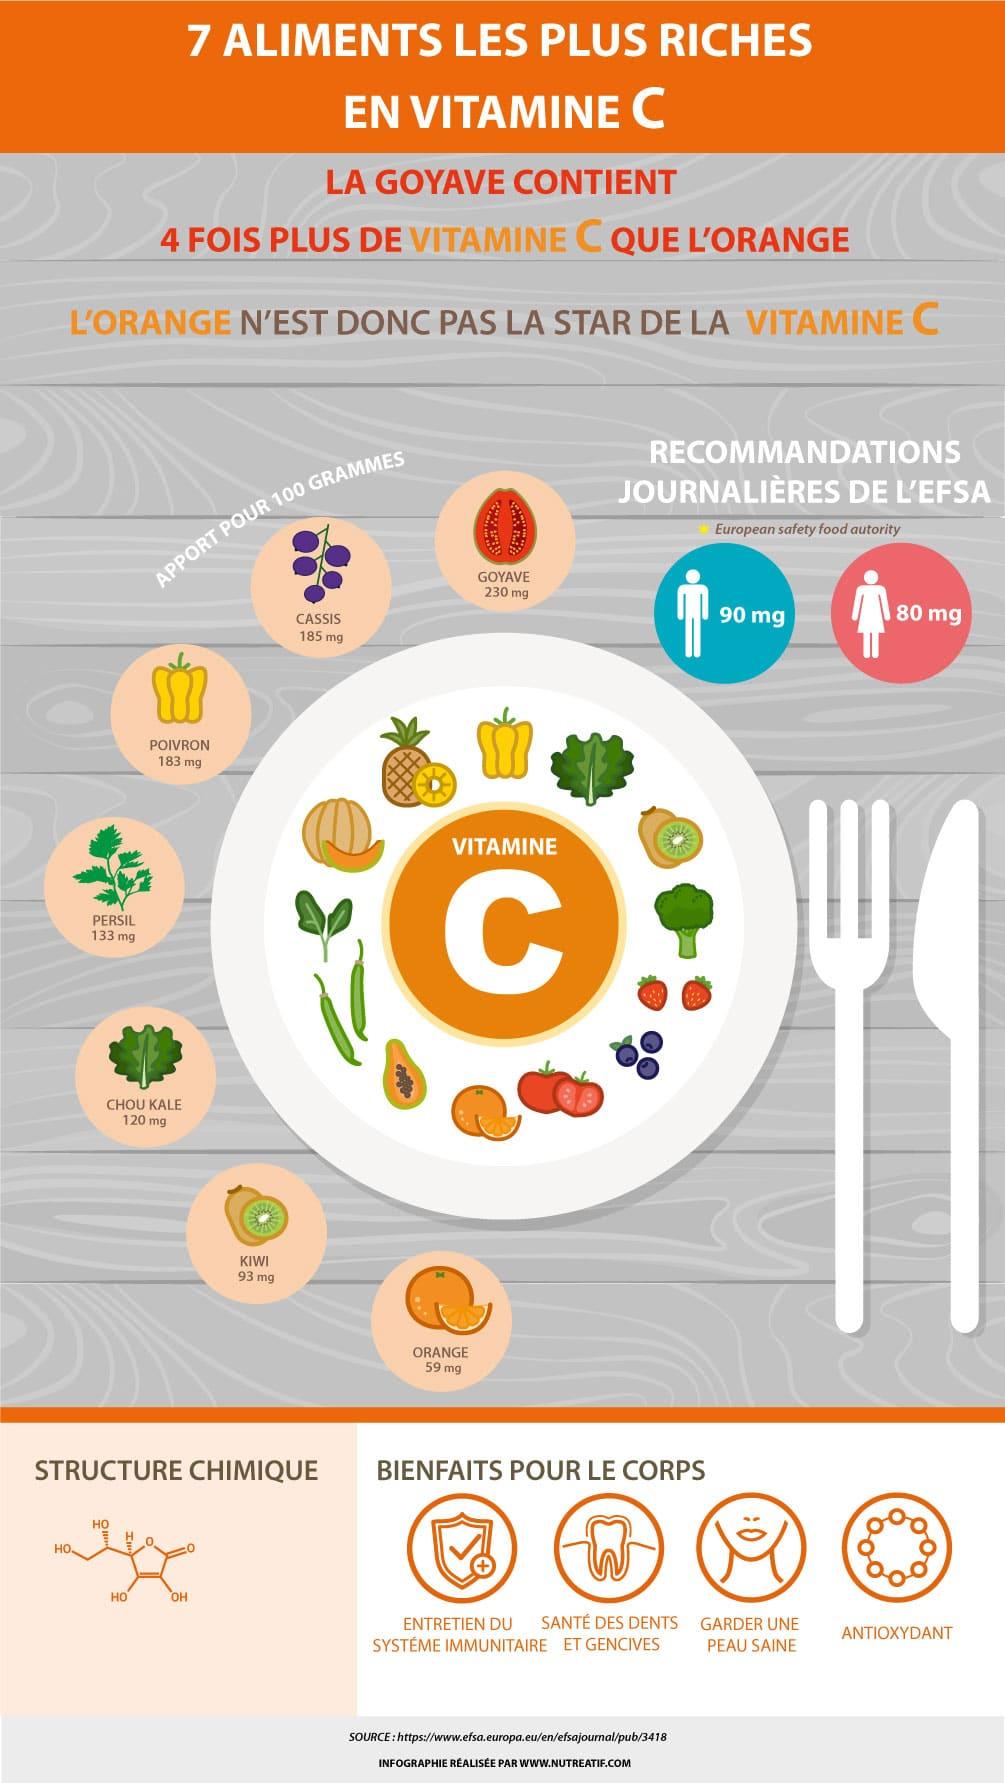 7-aliments-riches-en-vitamine-c-infographie